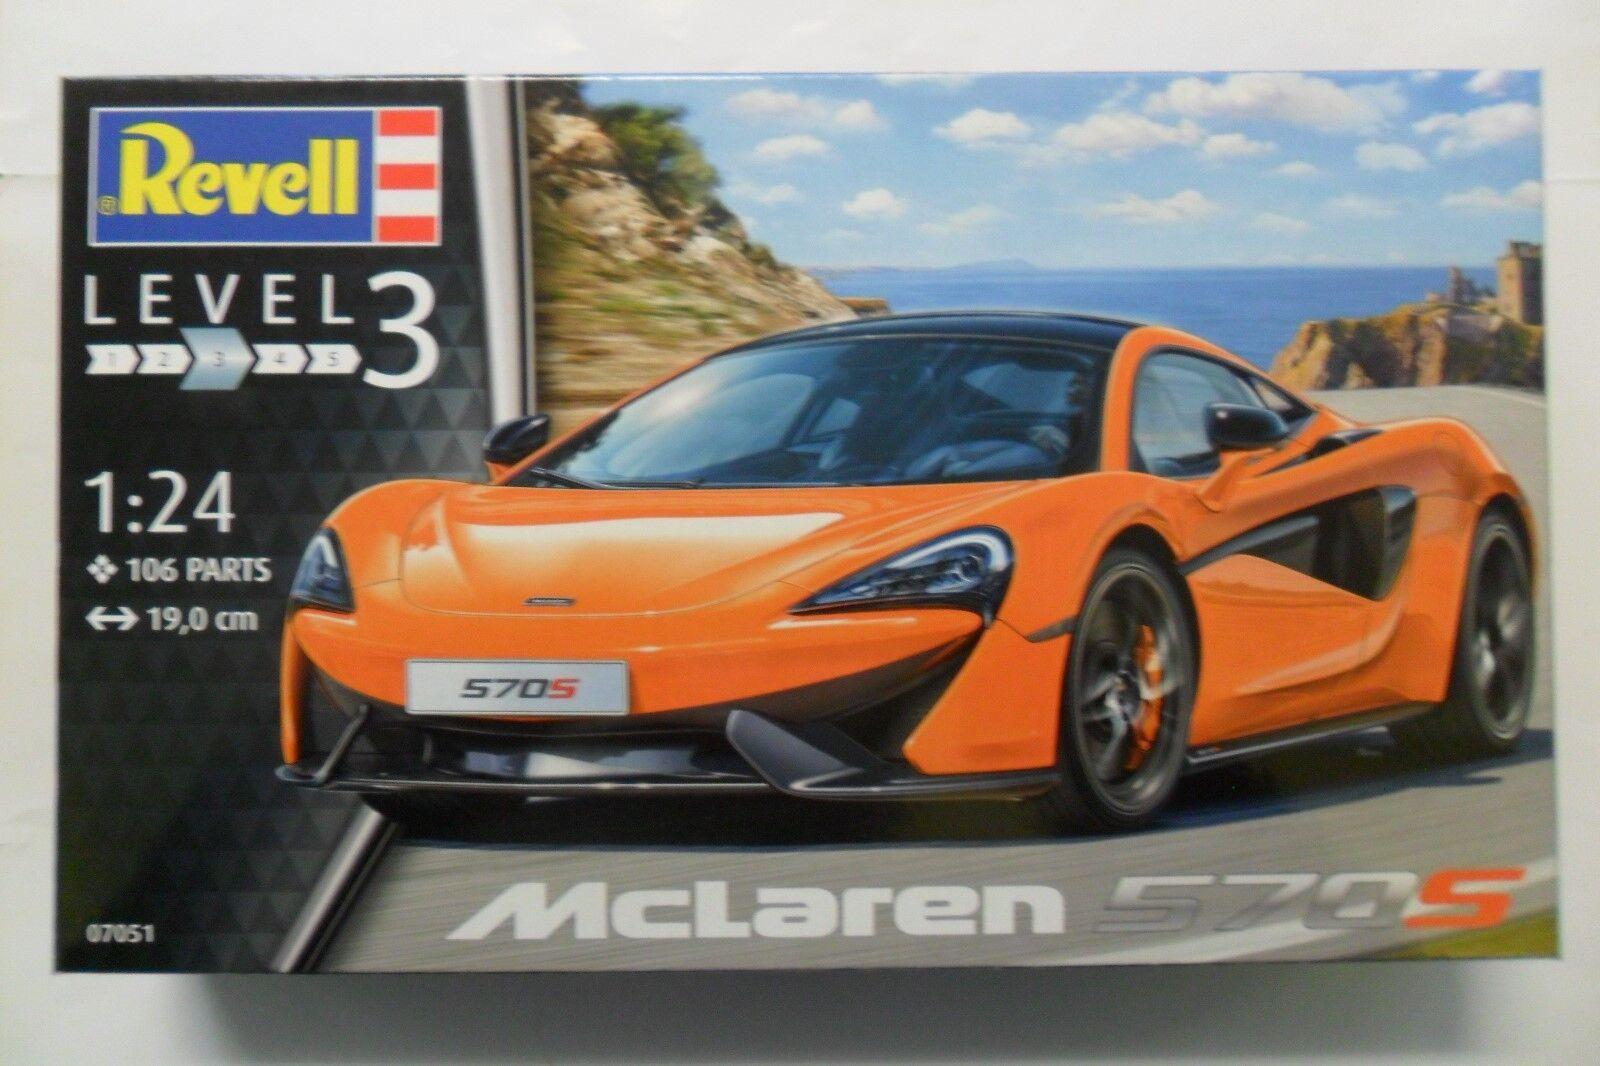 REVELL REVELL REVELL 1 24 KIT AUTO CAR MCLAREN 570S  LUNGHEZZA 19 CM  106 PARTI  ART 07051 499c73